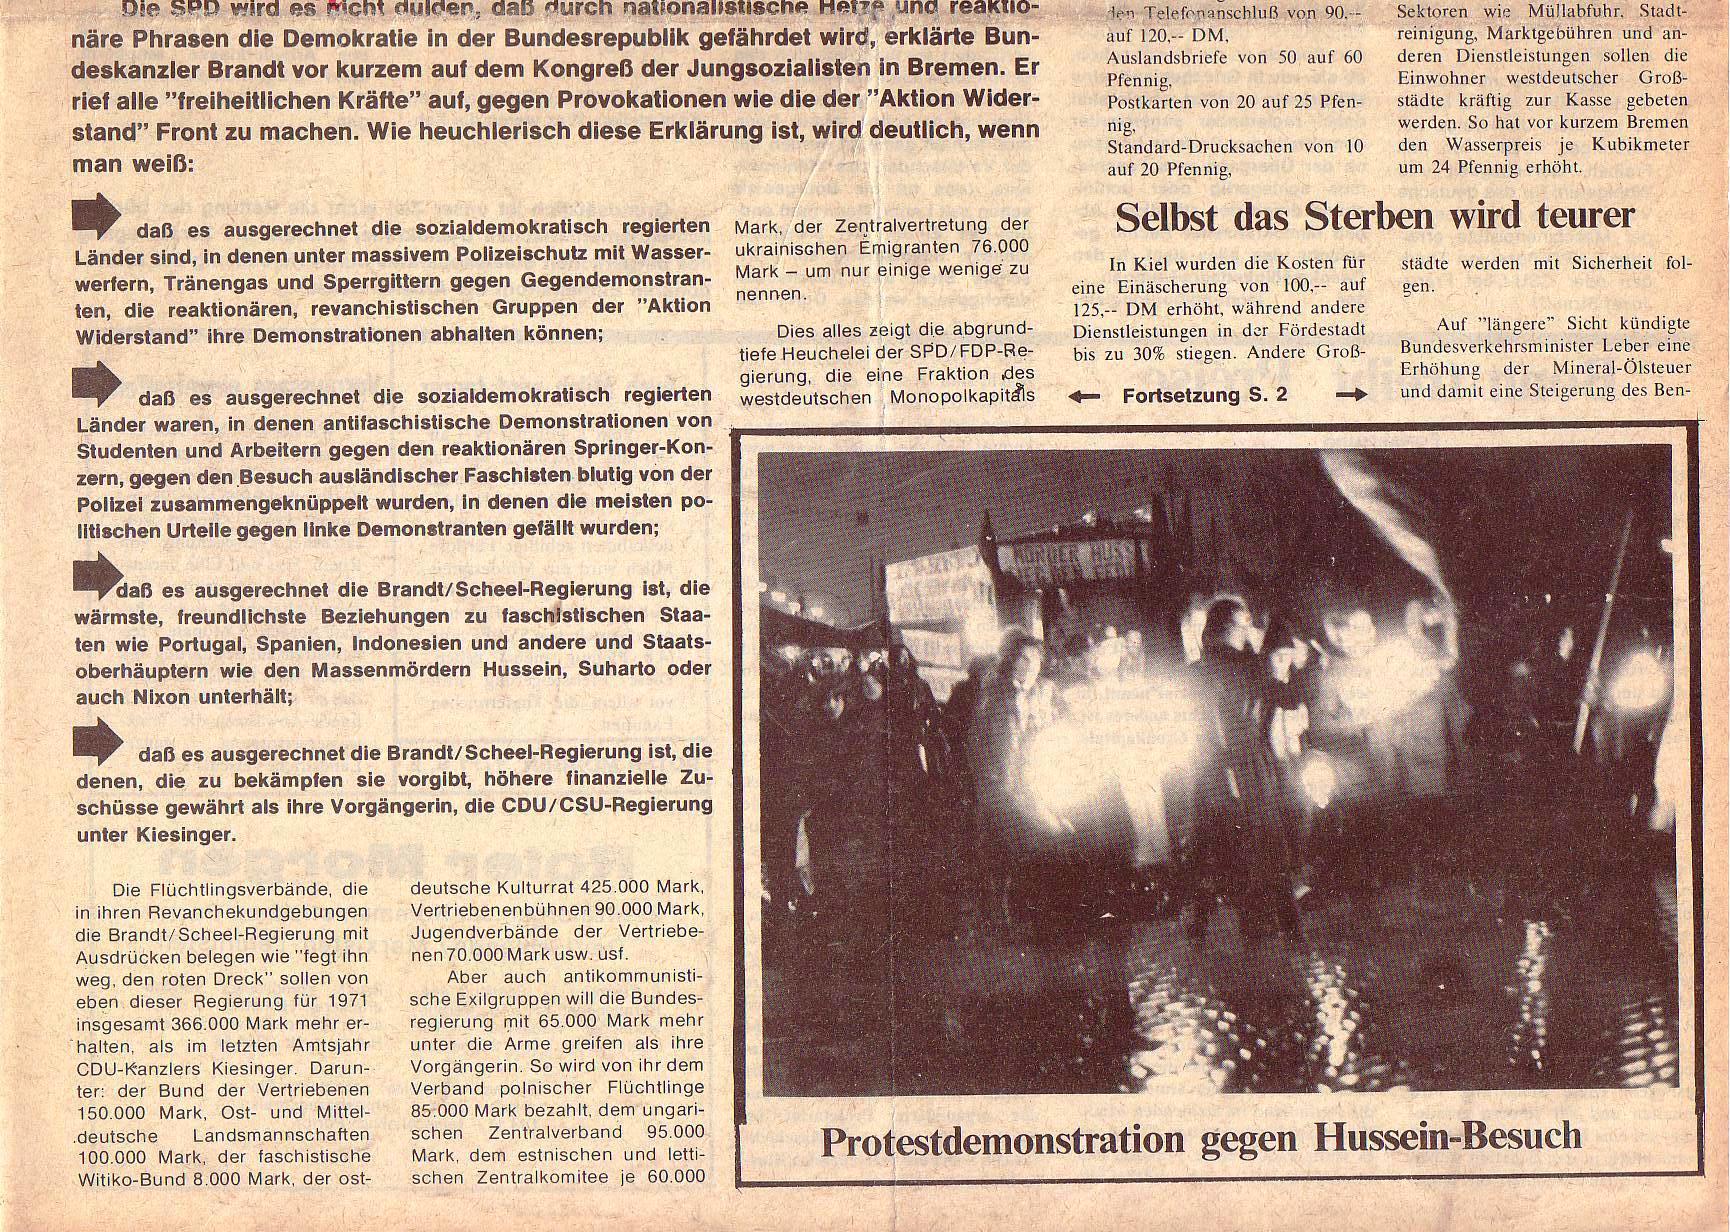 Roter Morgen, 5. Jg., Januar 1971, Nr. 1, Seite 1b